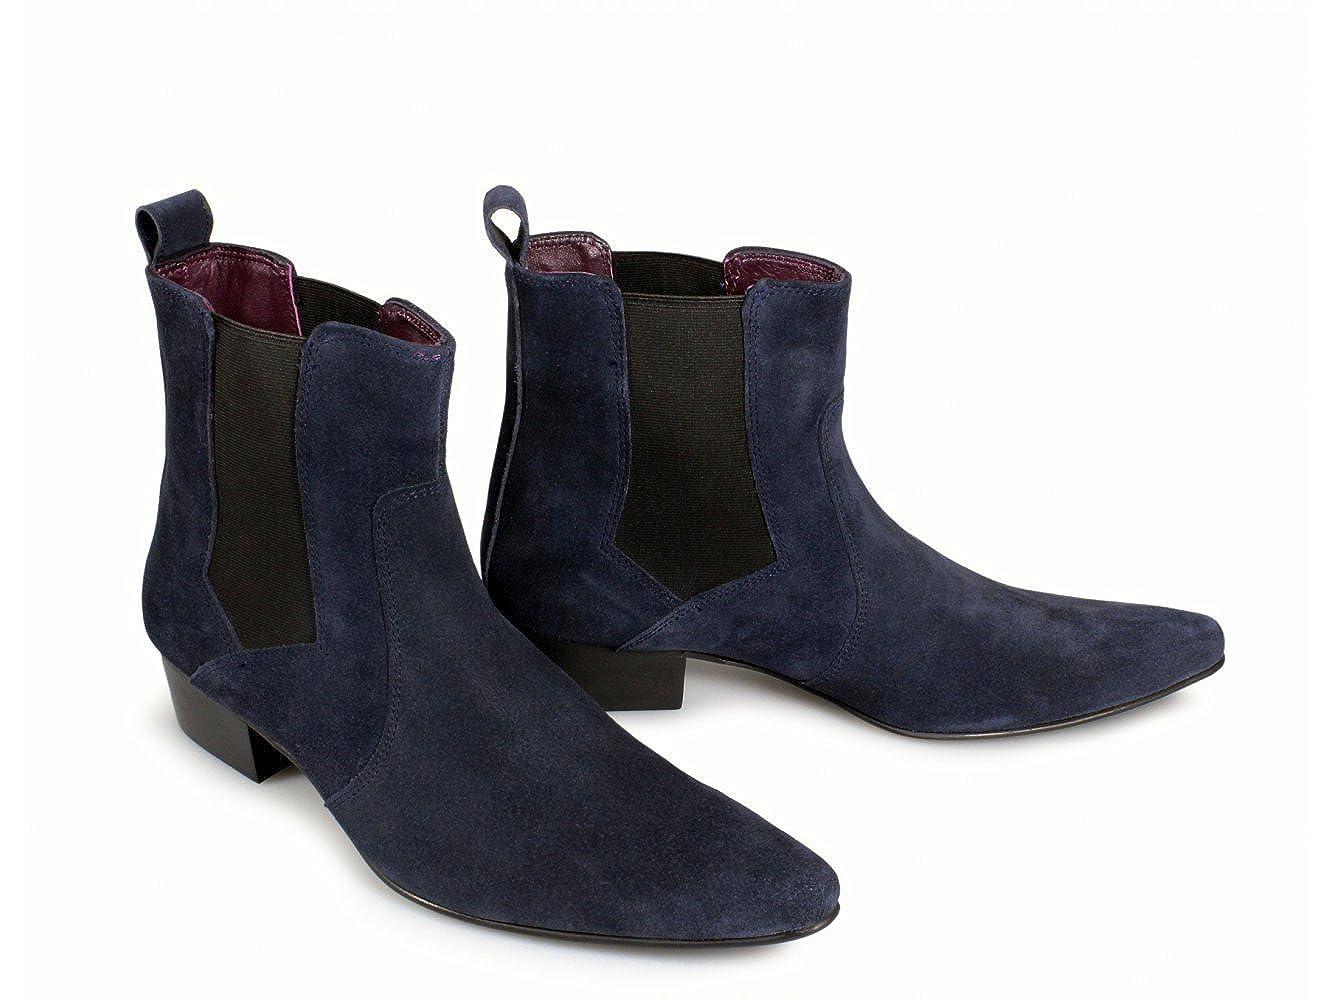 b0da00fa5b40 Gucinari ROMEO Mens Winklepicker Suede Chelsea Boots Navy UK 12   Amazon.co.uk  Shoes   Bags